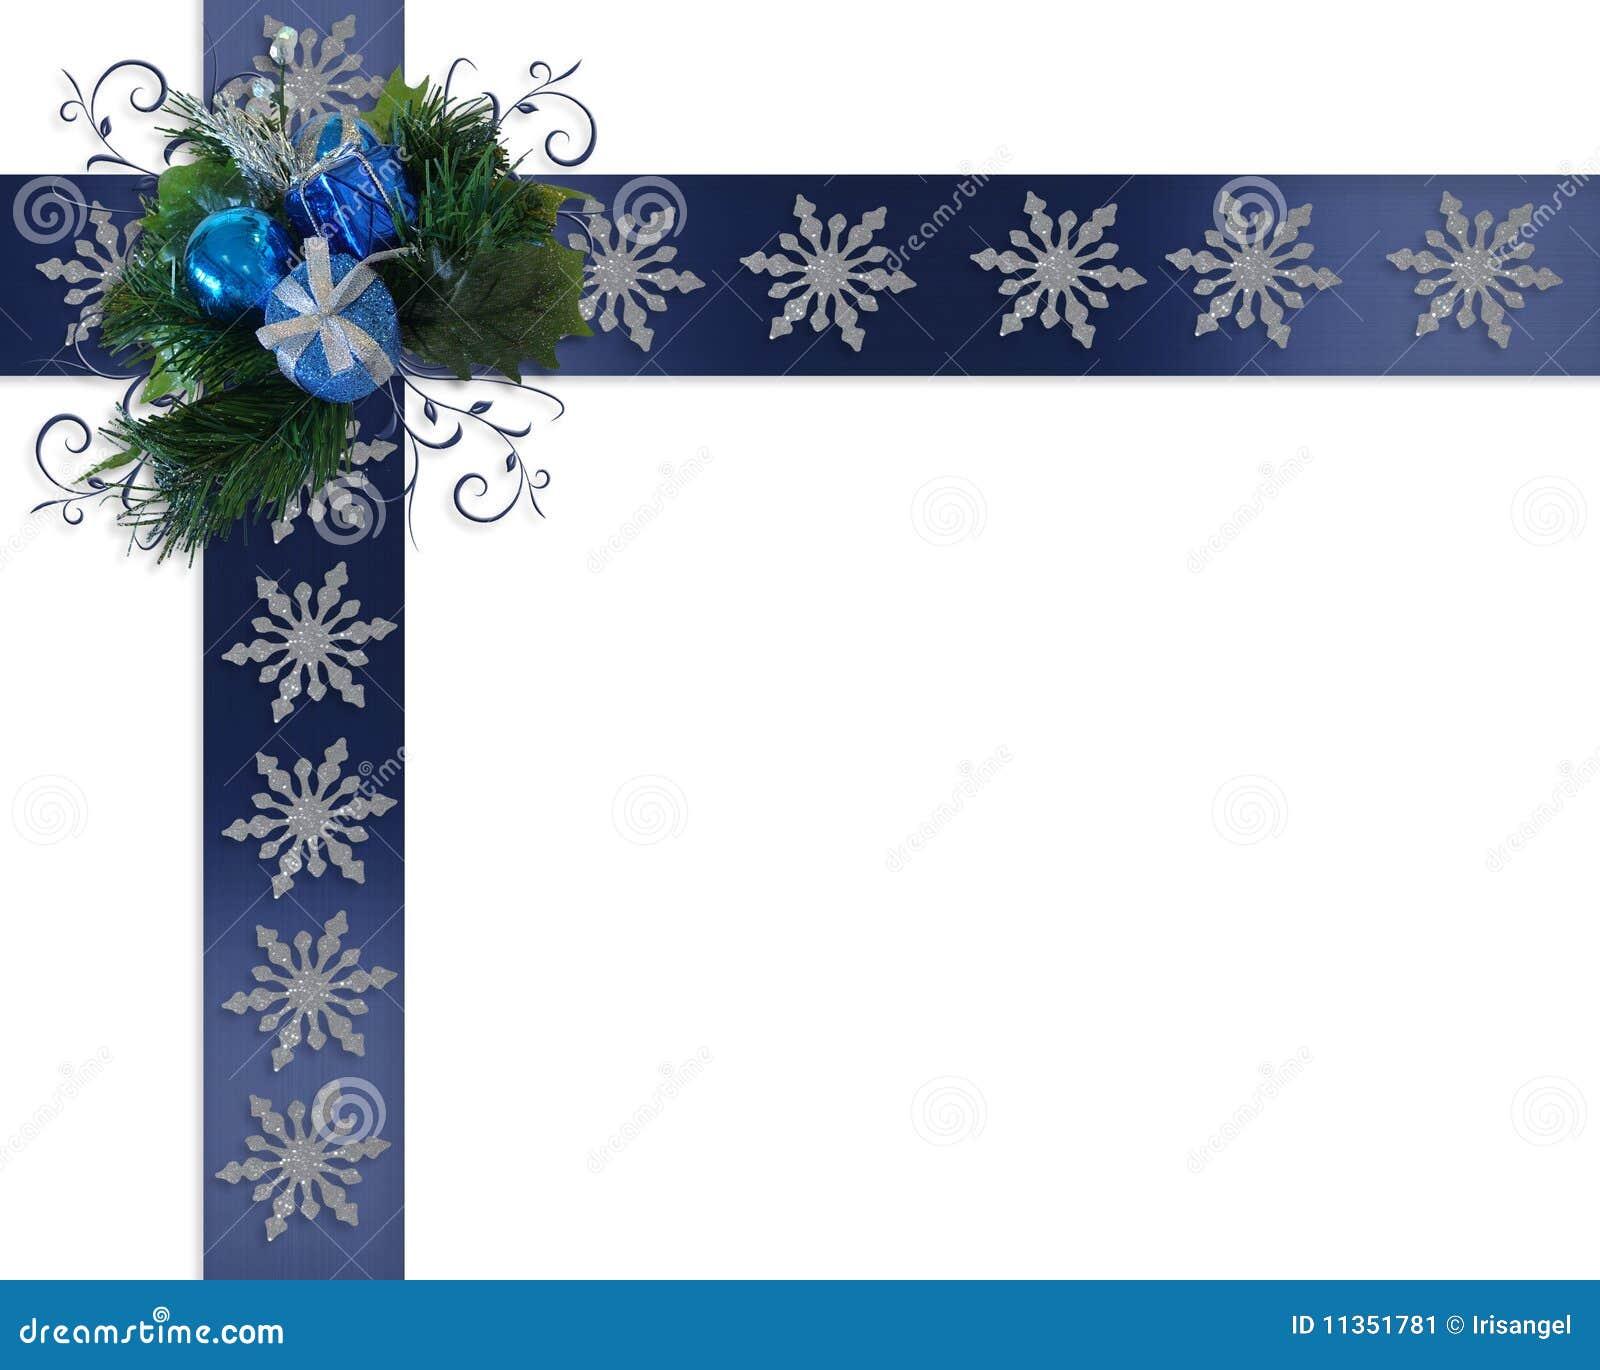 Christmas Border Snowflakes On Blue Ribbons Stock Image - Image ...